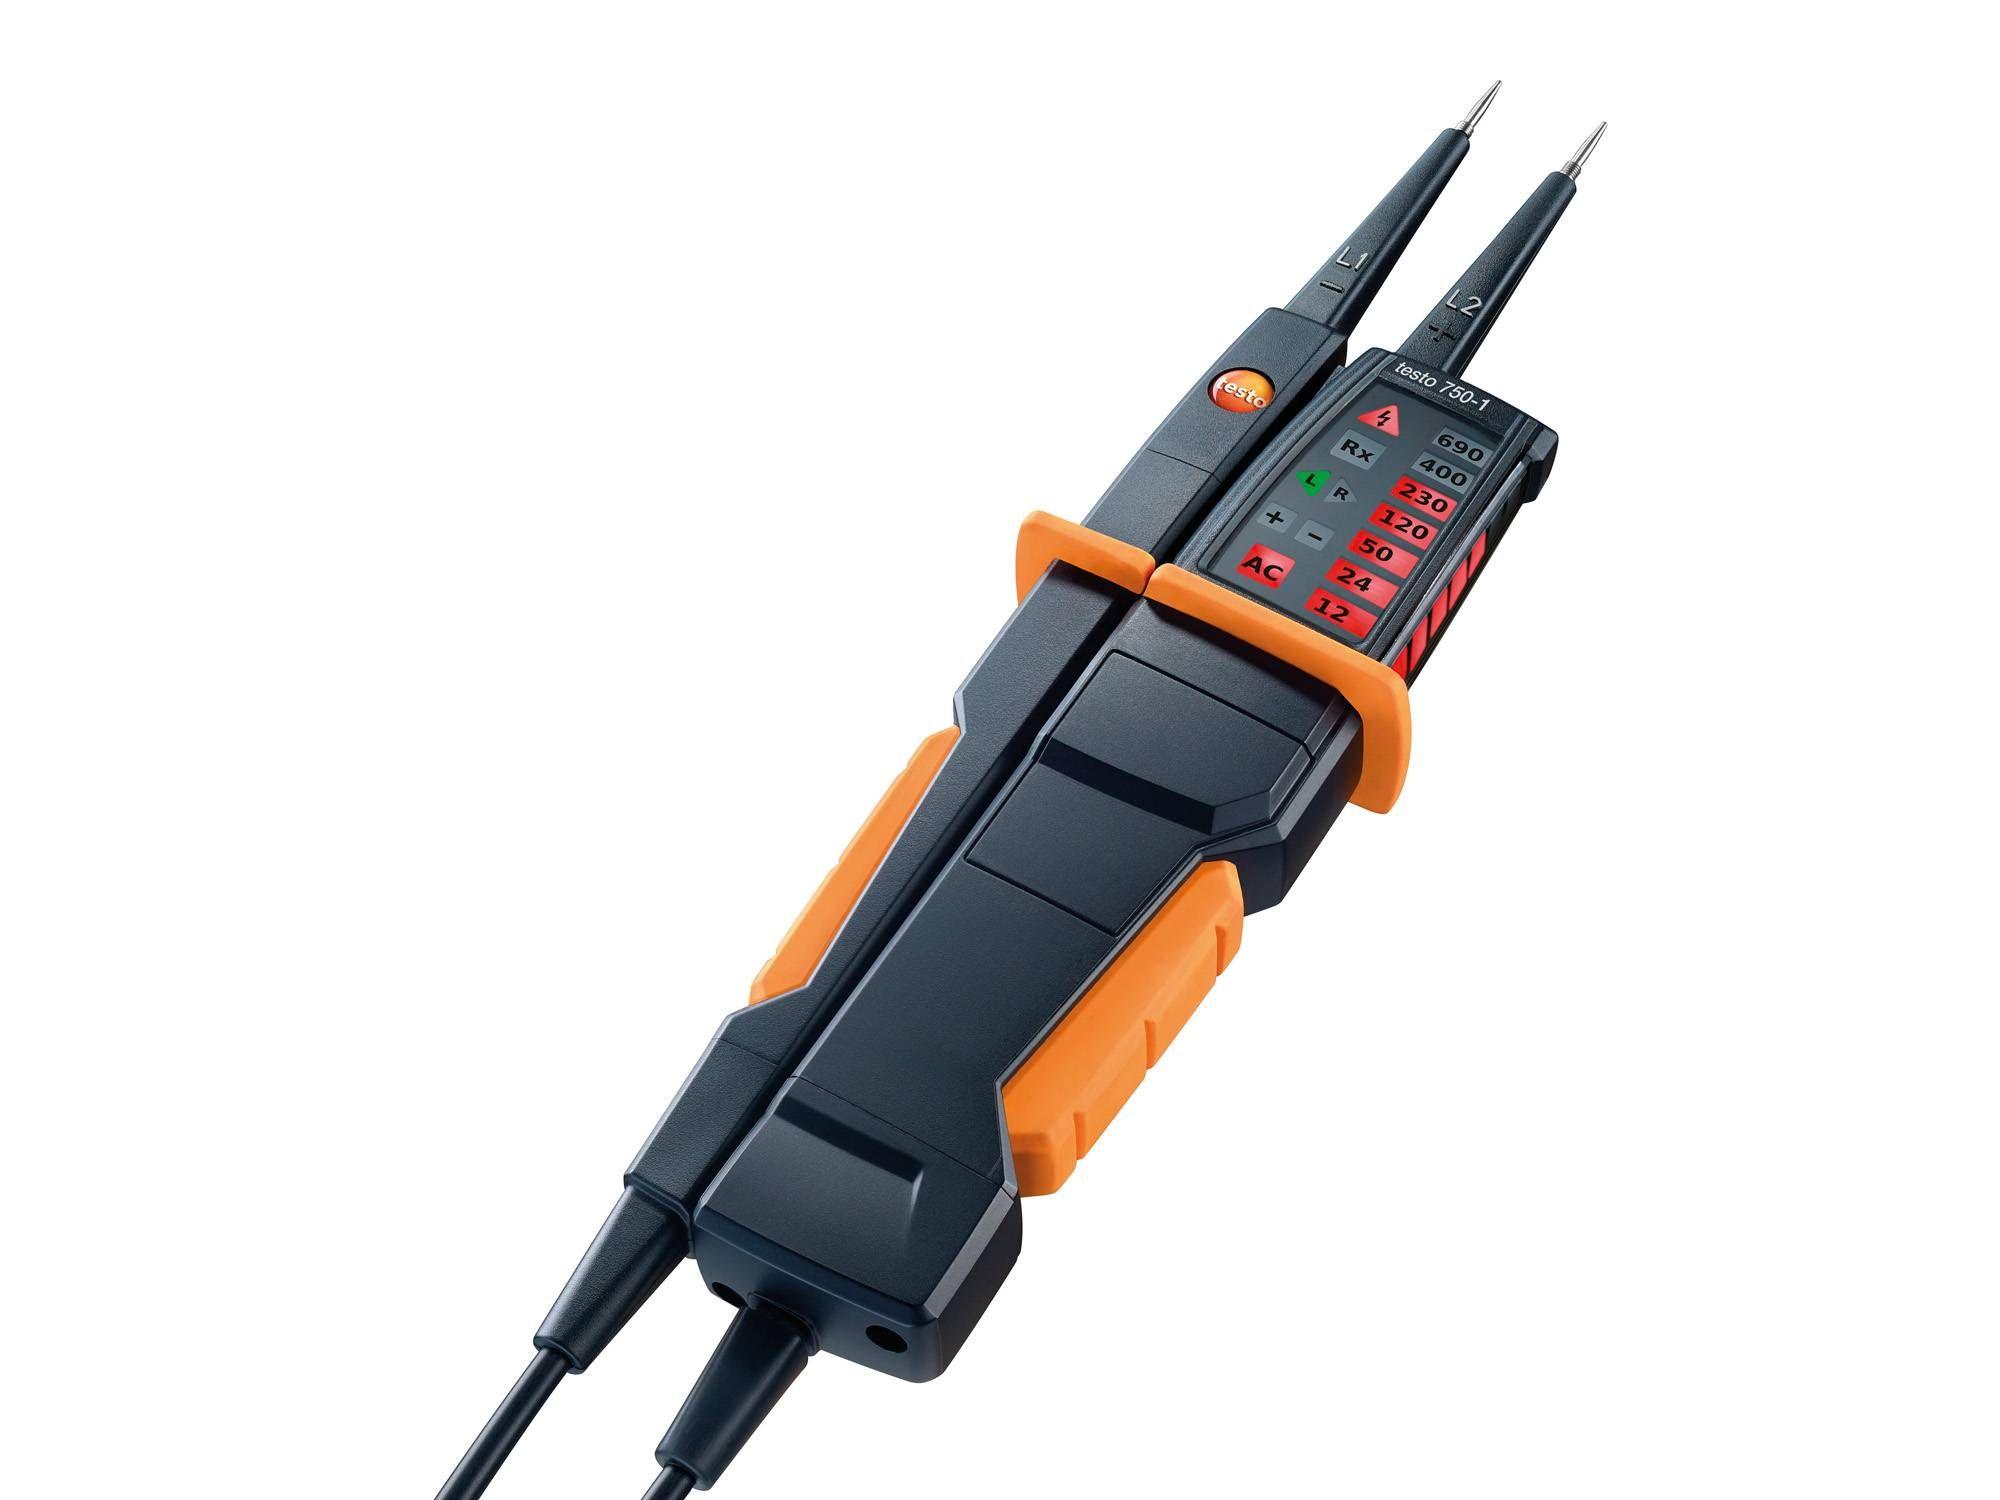 Voltage tester testo 750-1